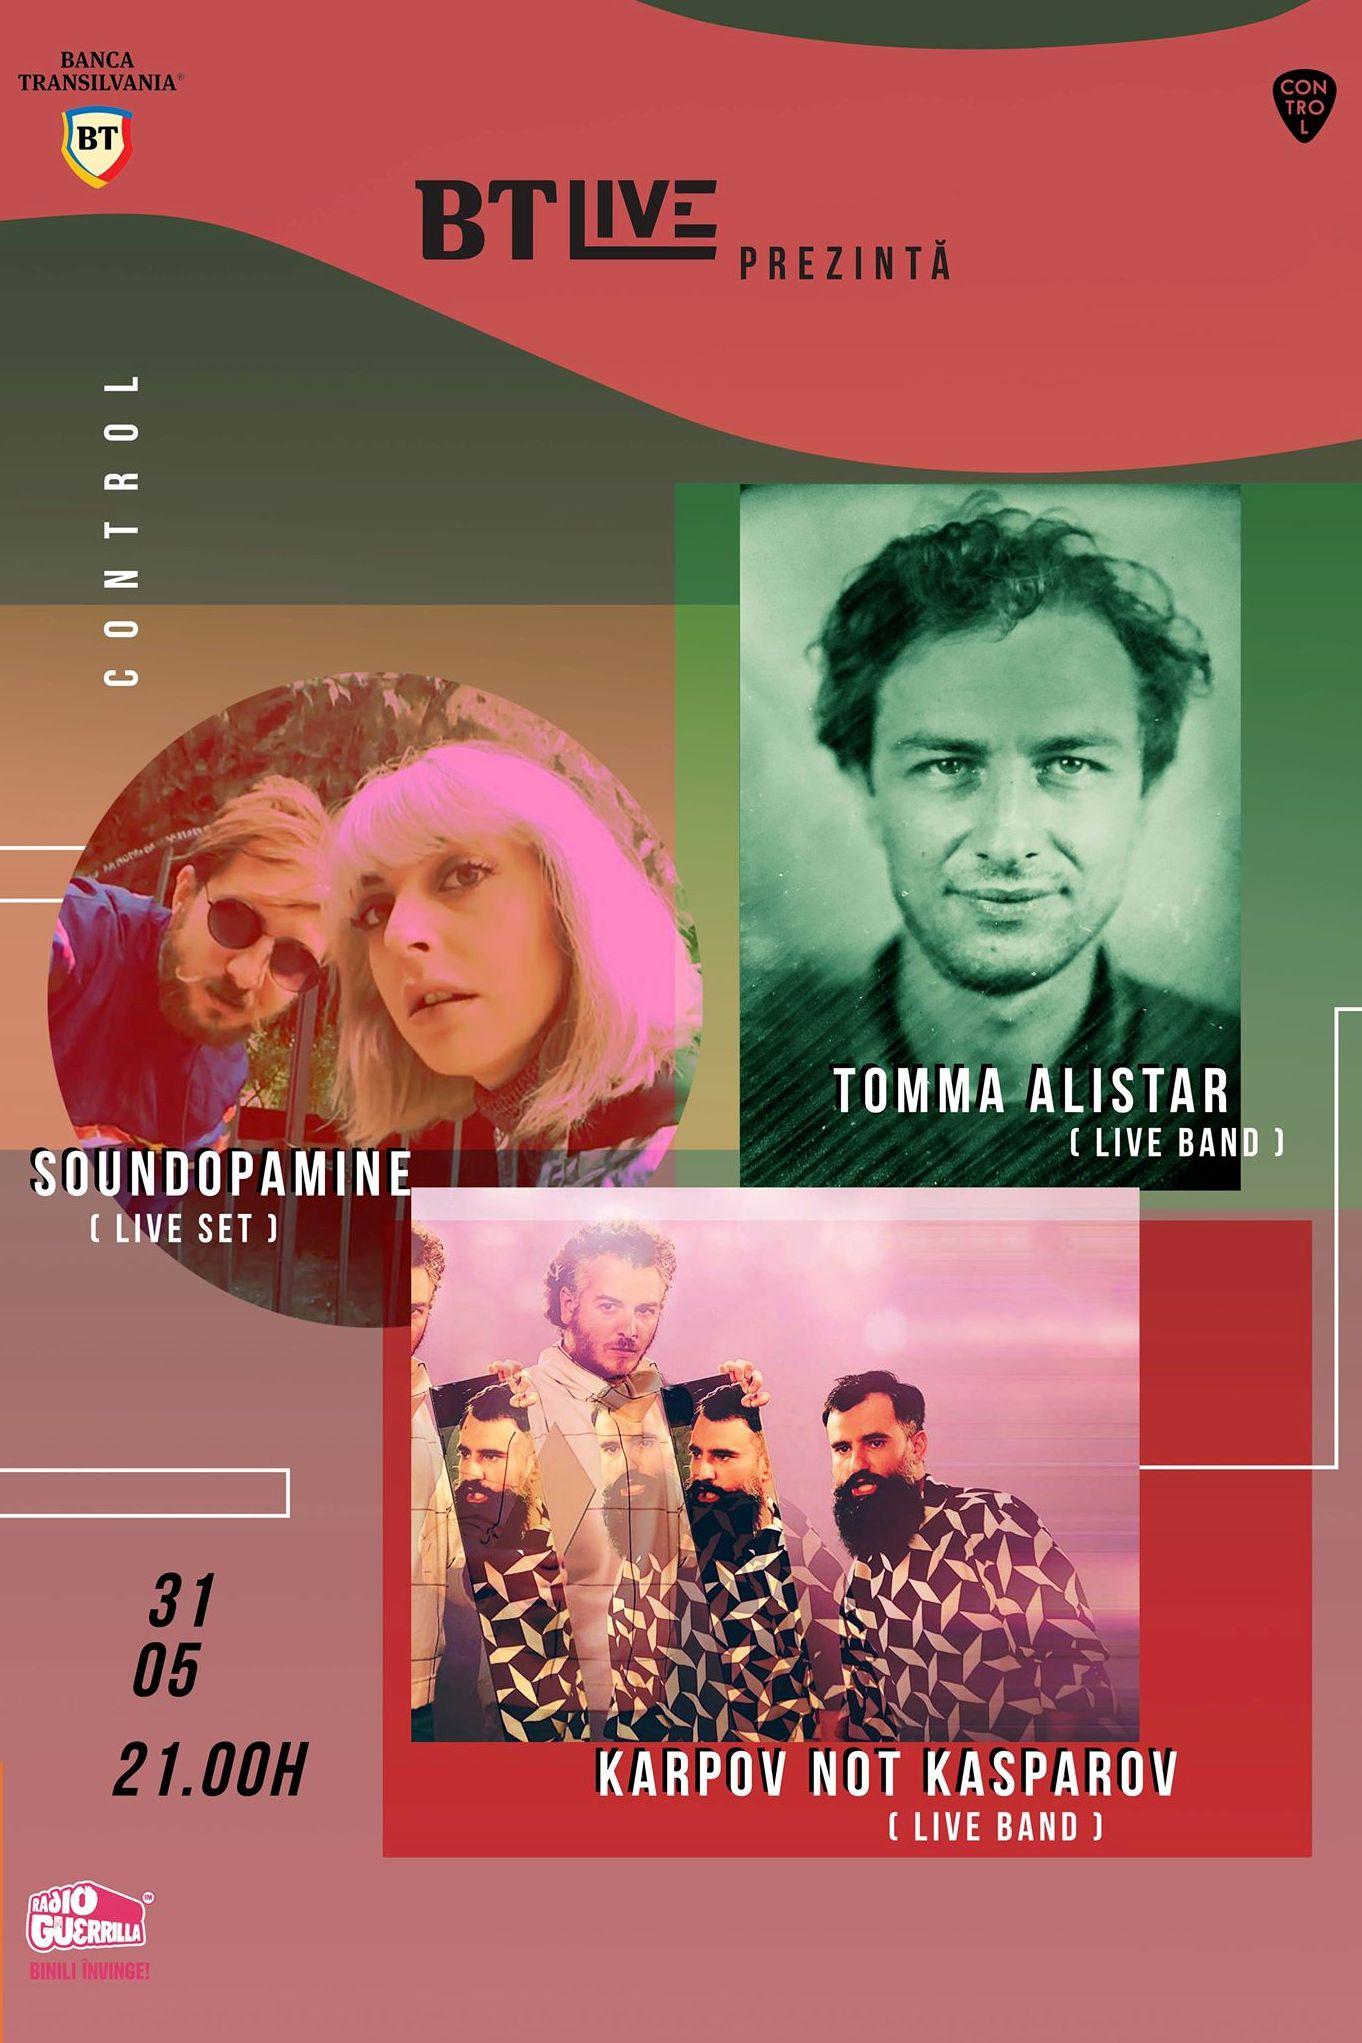 Karpov not Kasparov/ Tomma Alistar/ Soundopamine la Club Control